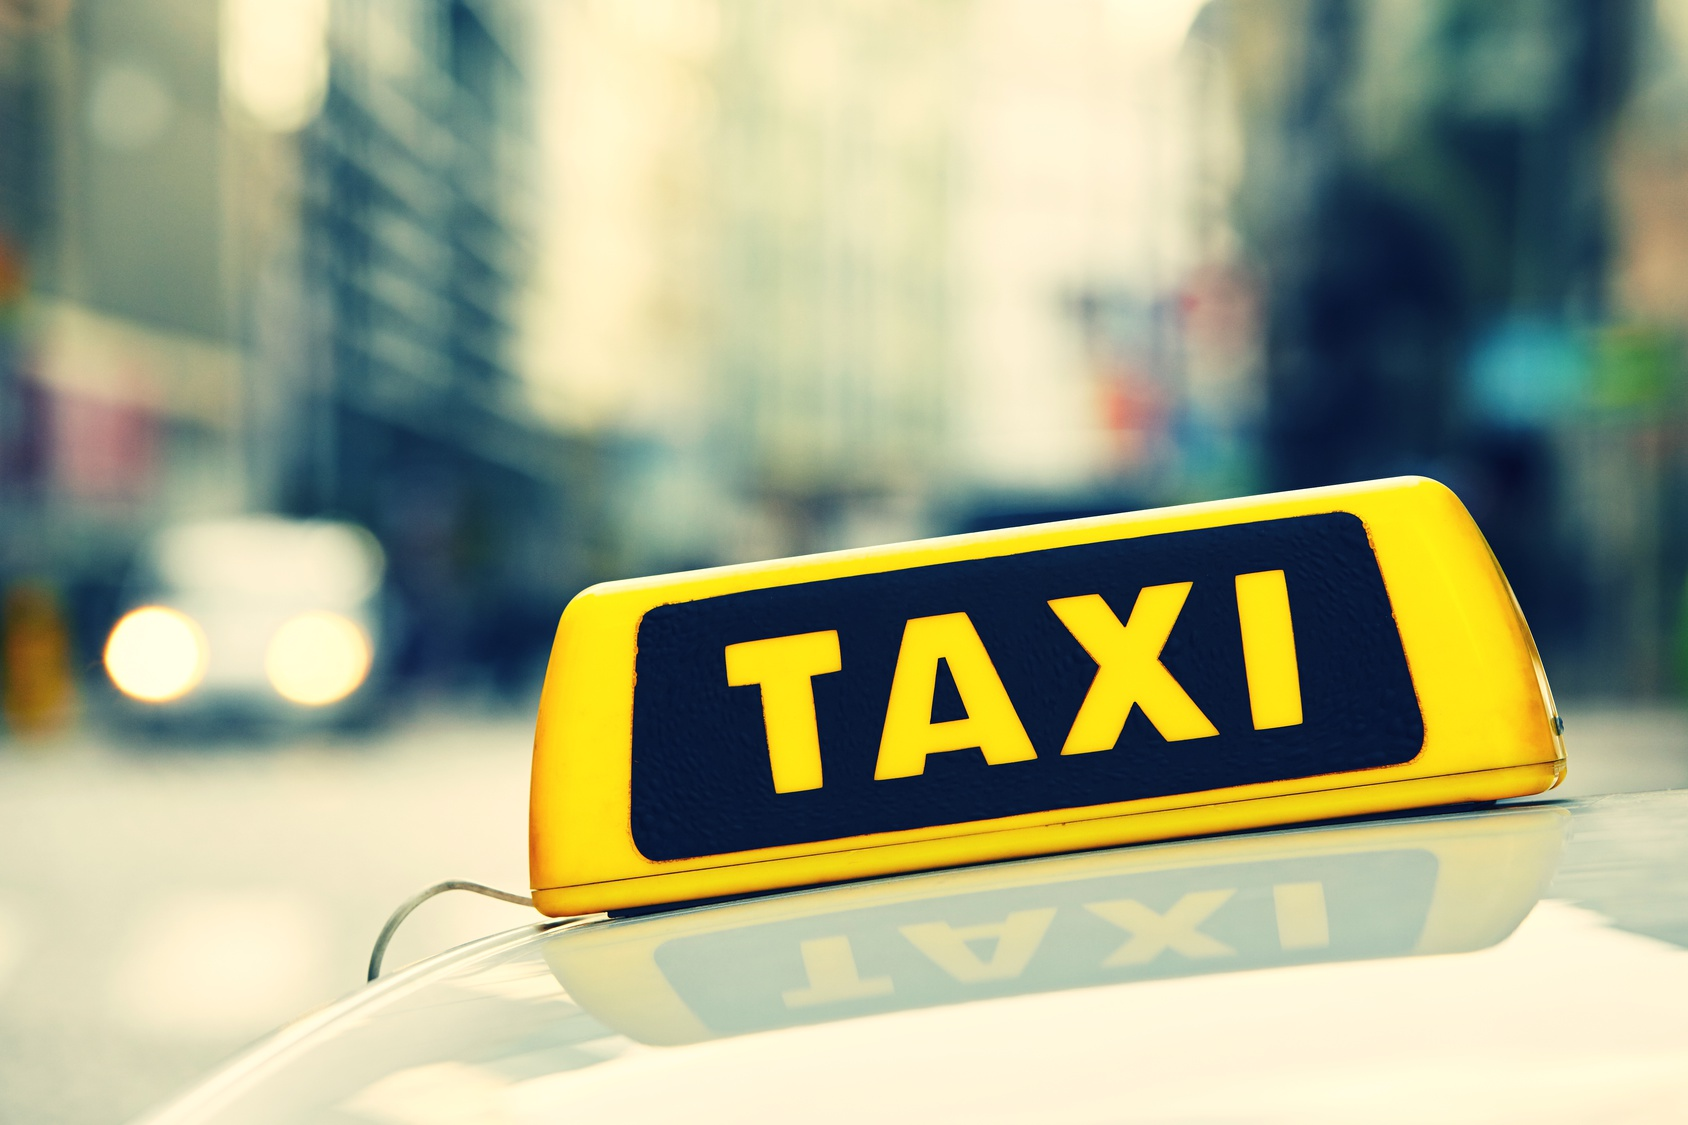 Taxi NCC Muscarella